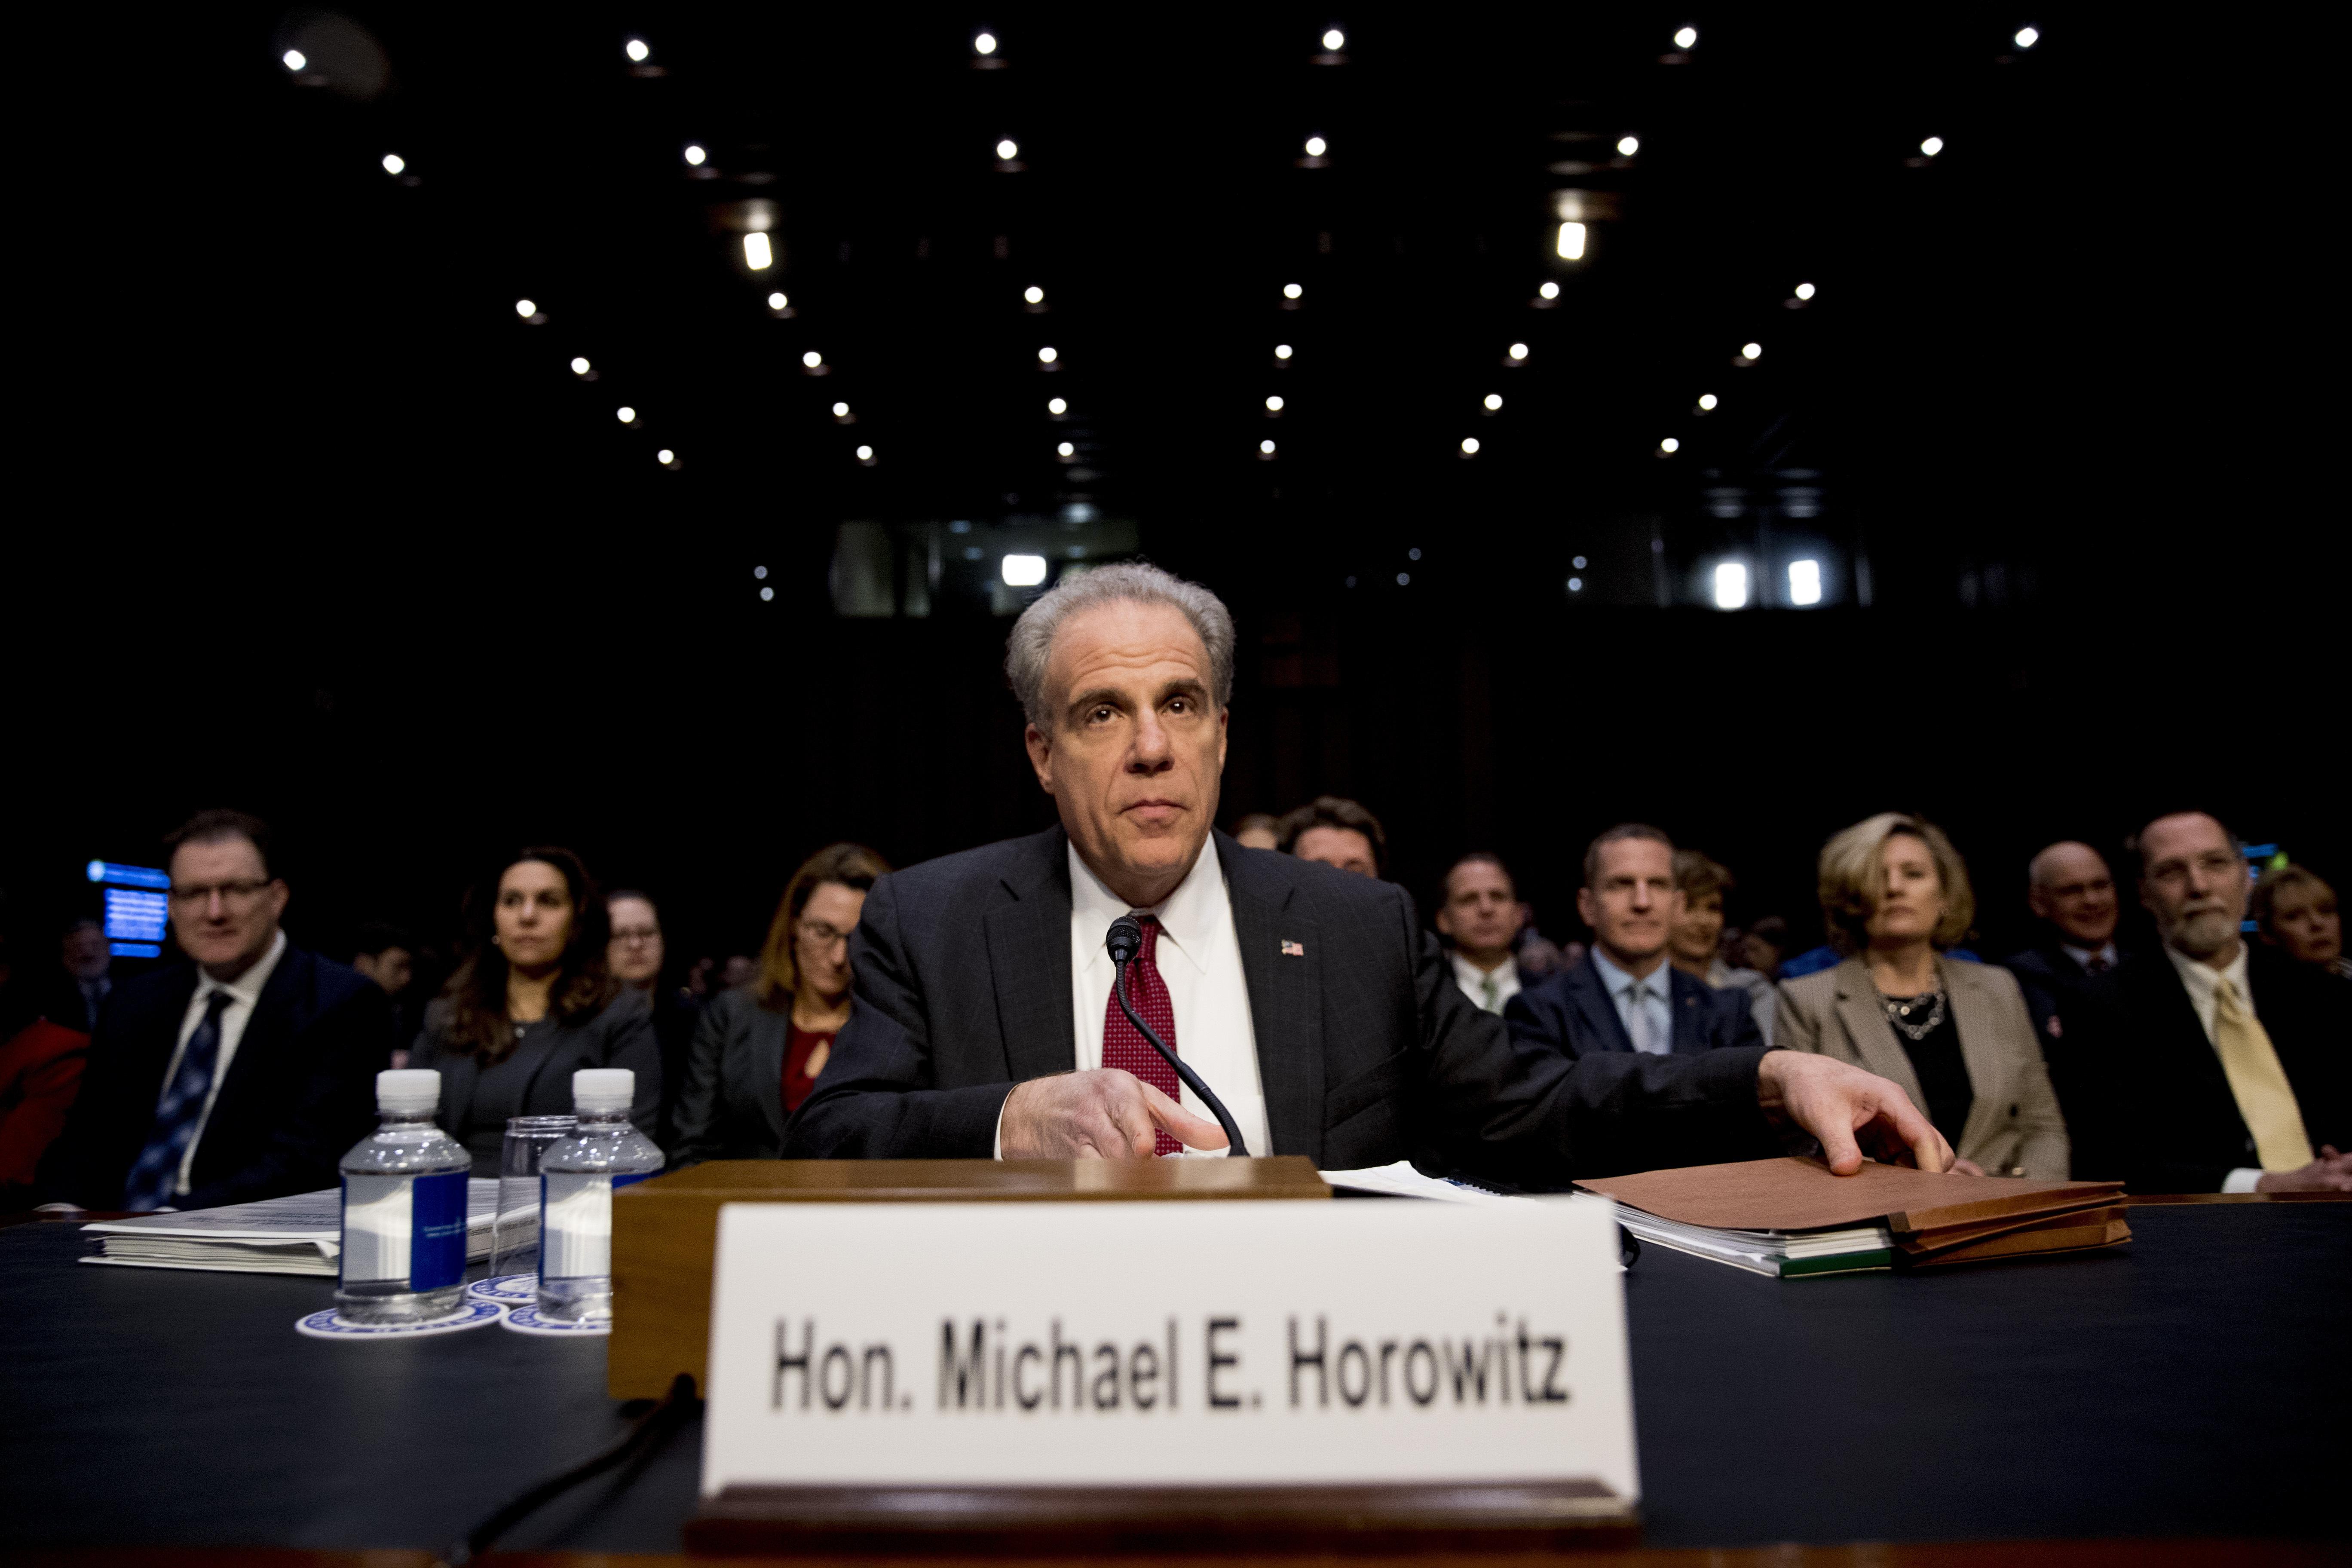 DOJ Watchdog Tells Congress FBI's Russia Probe Marred by 'Basic and Fundamental Errors'